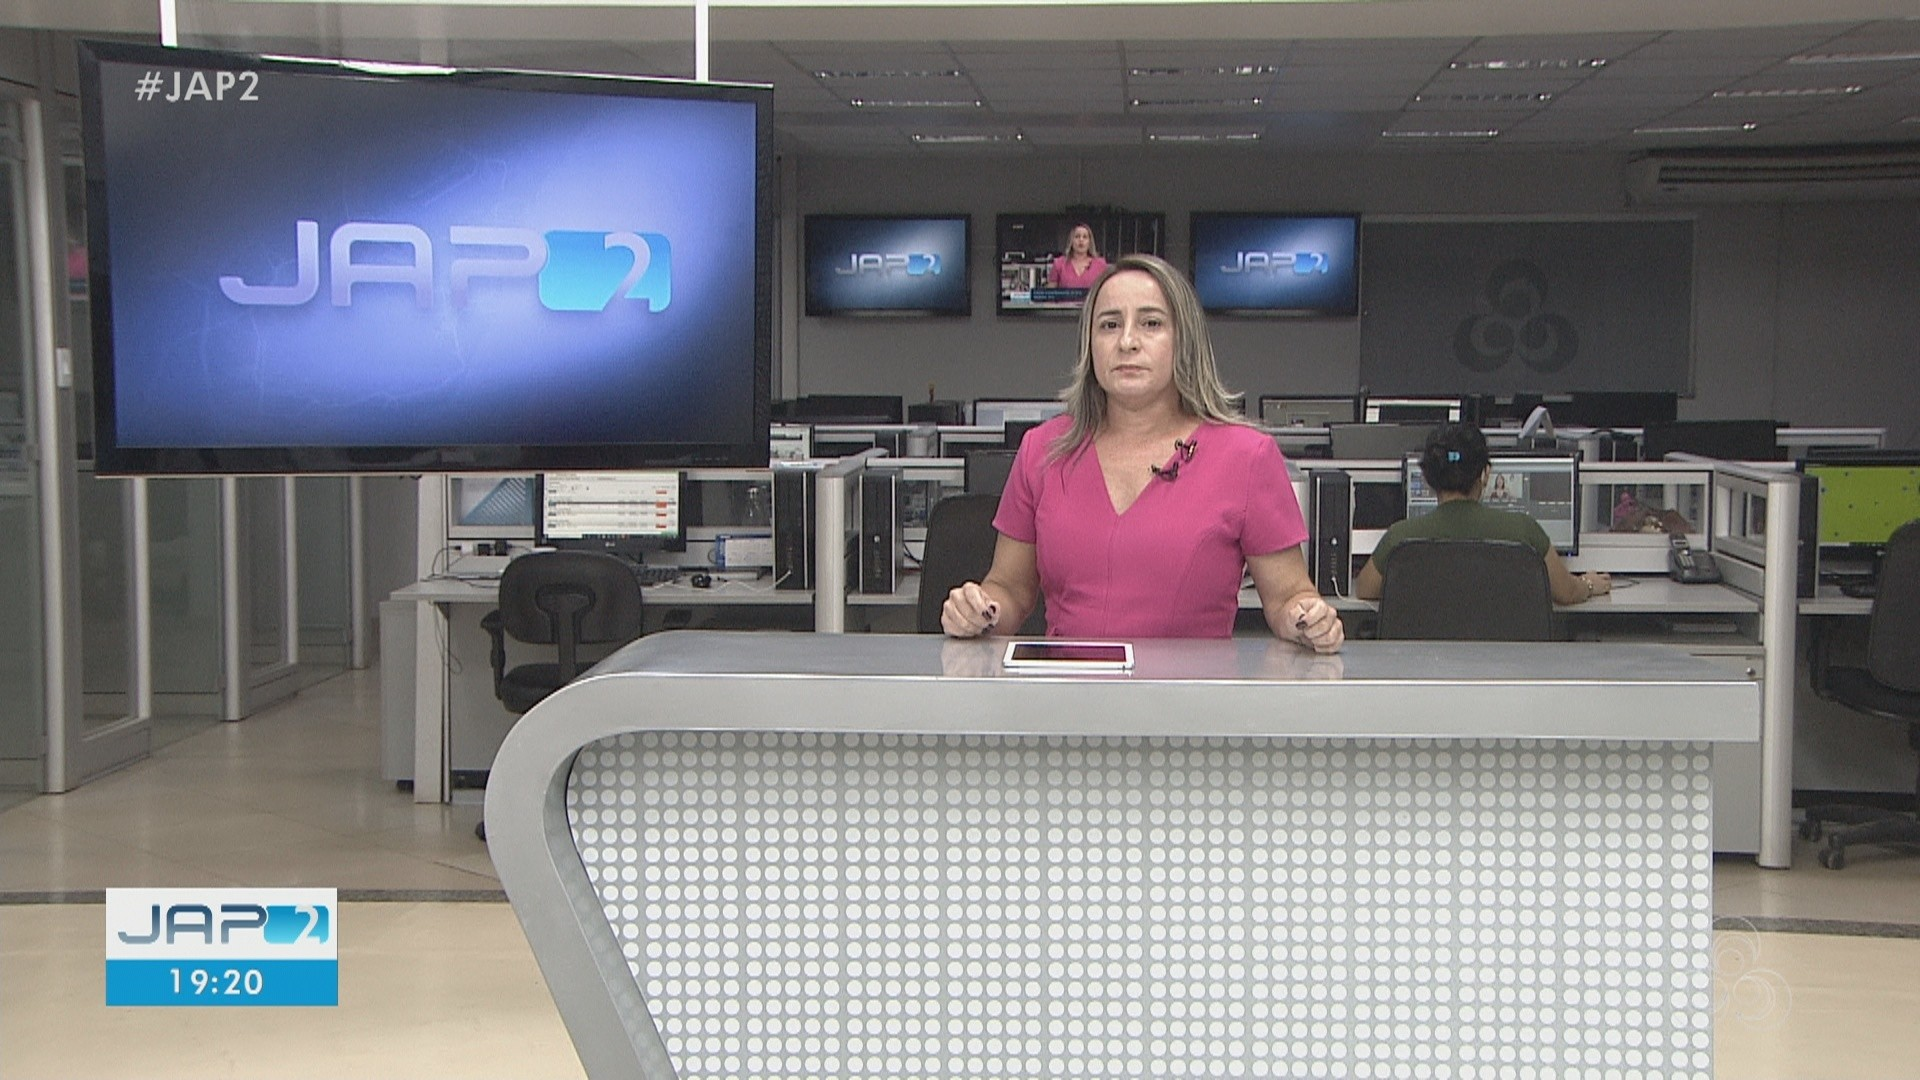 VÍDEOS: JAP2 de sábado, 11 de julho de 2020